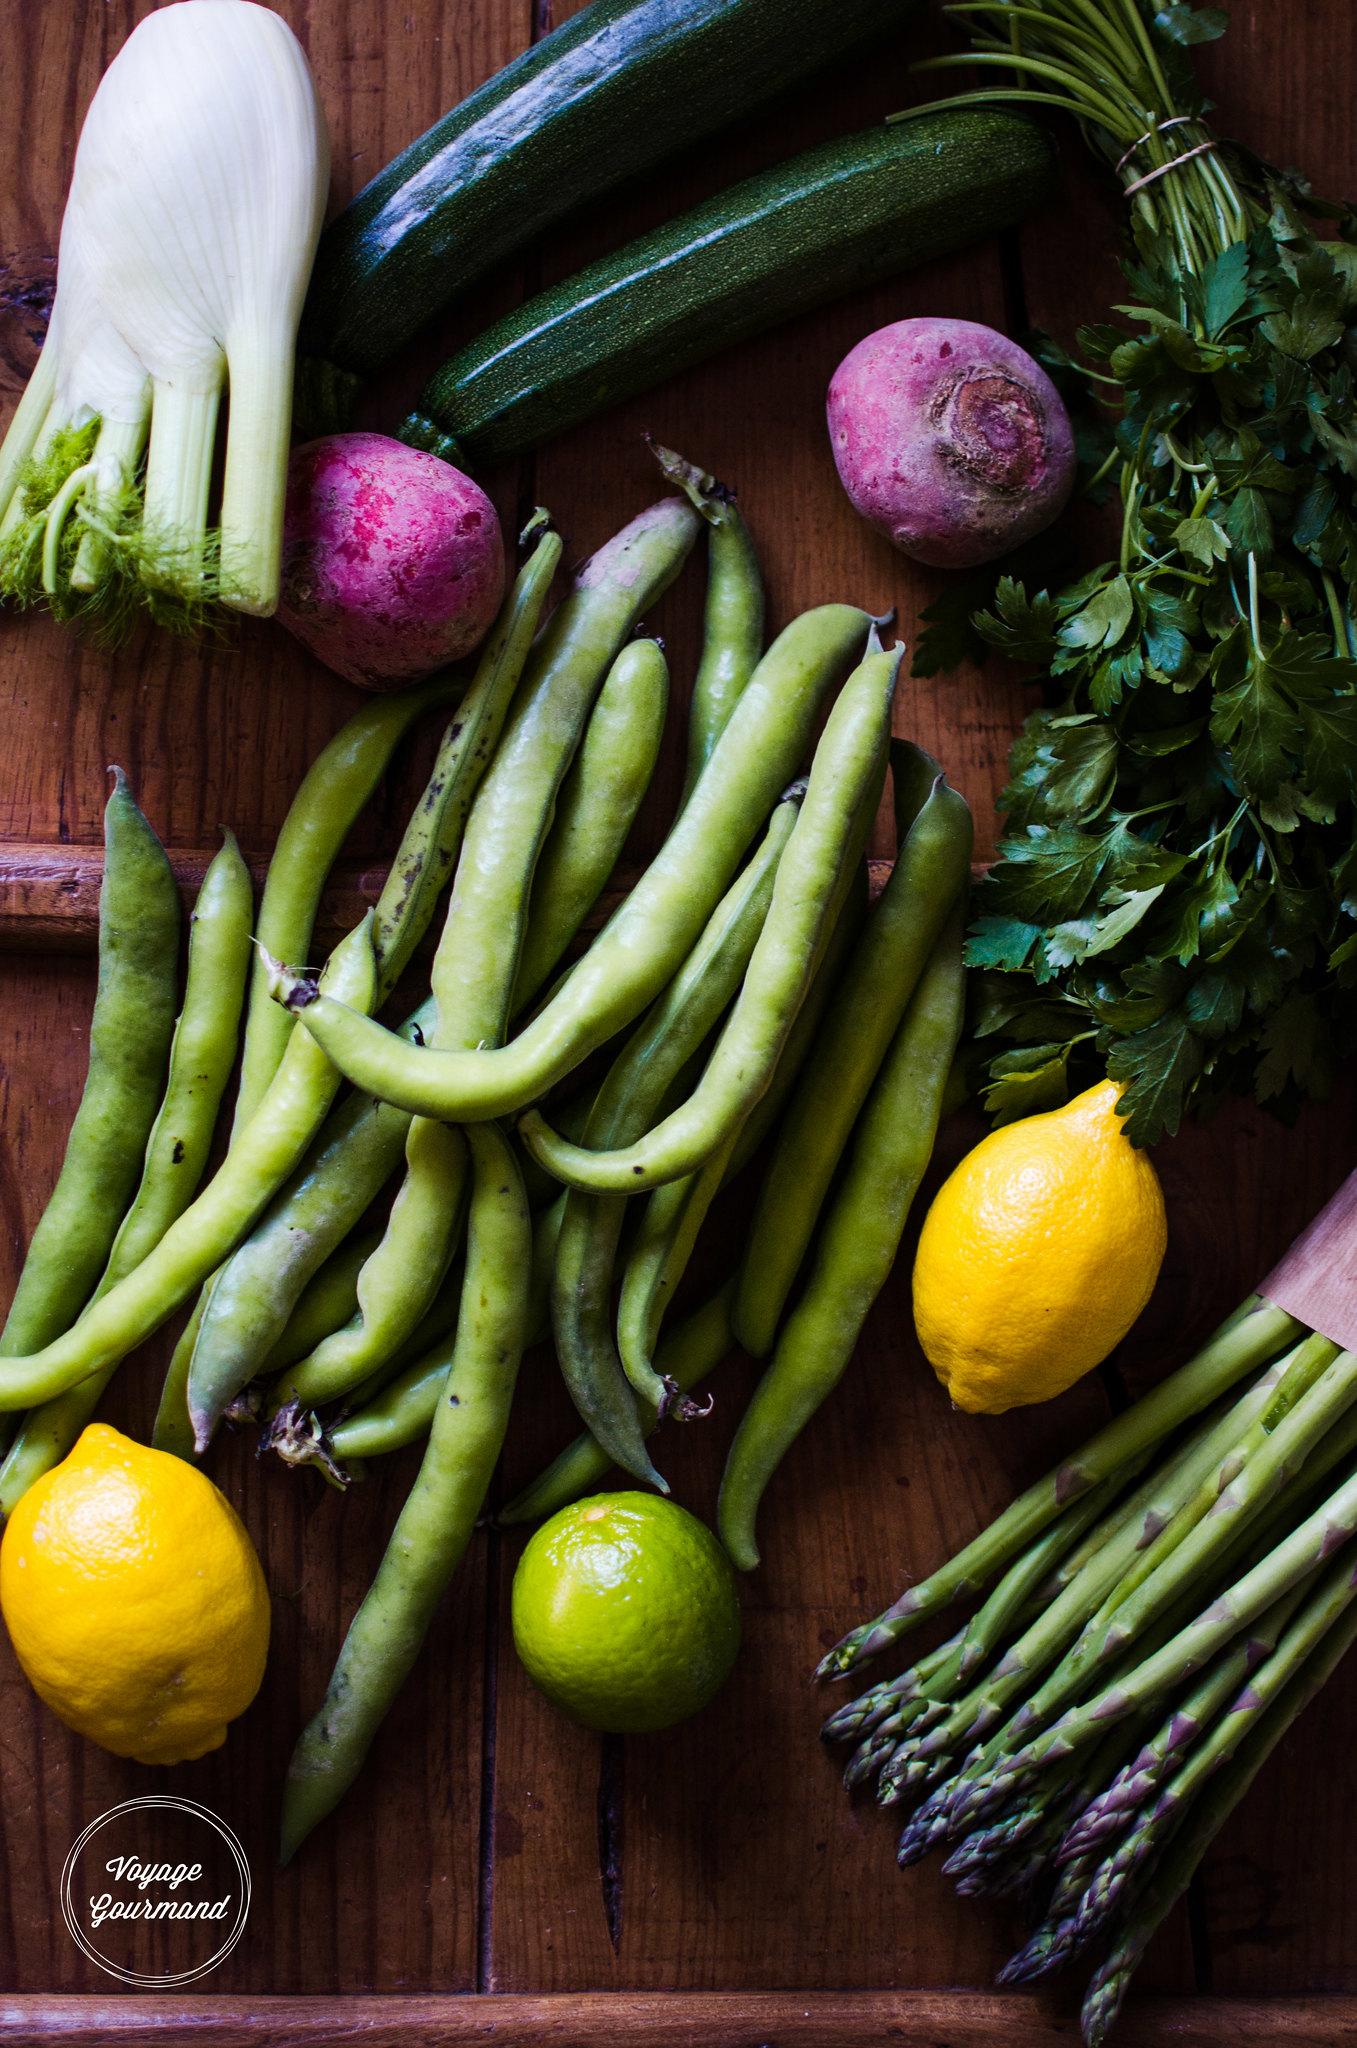 Légumes de saison - Printemps 2016 | Voyage Gourmand